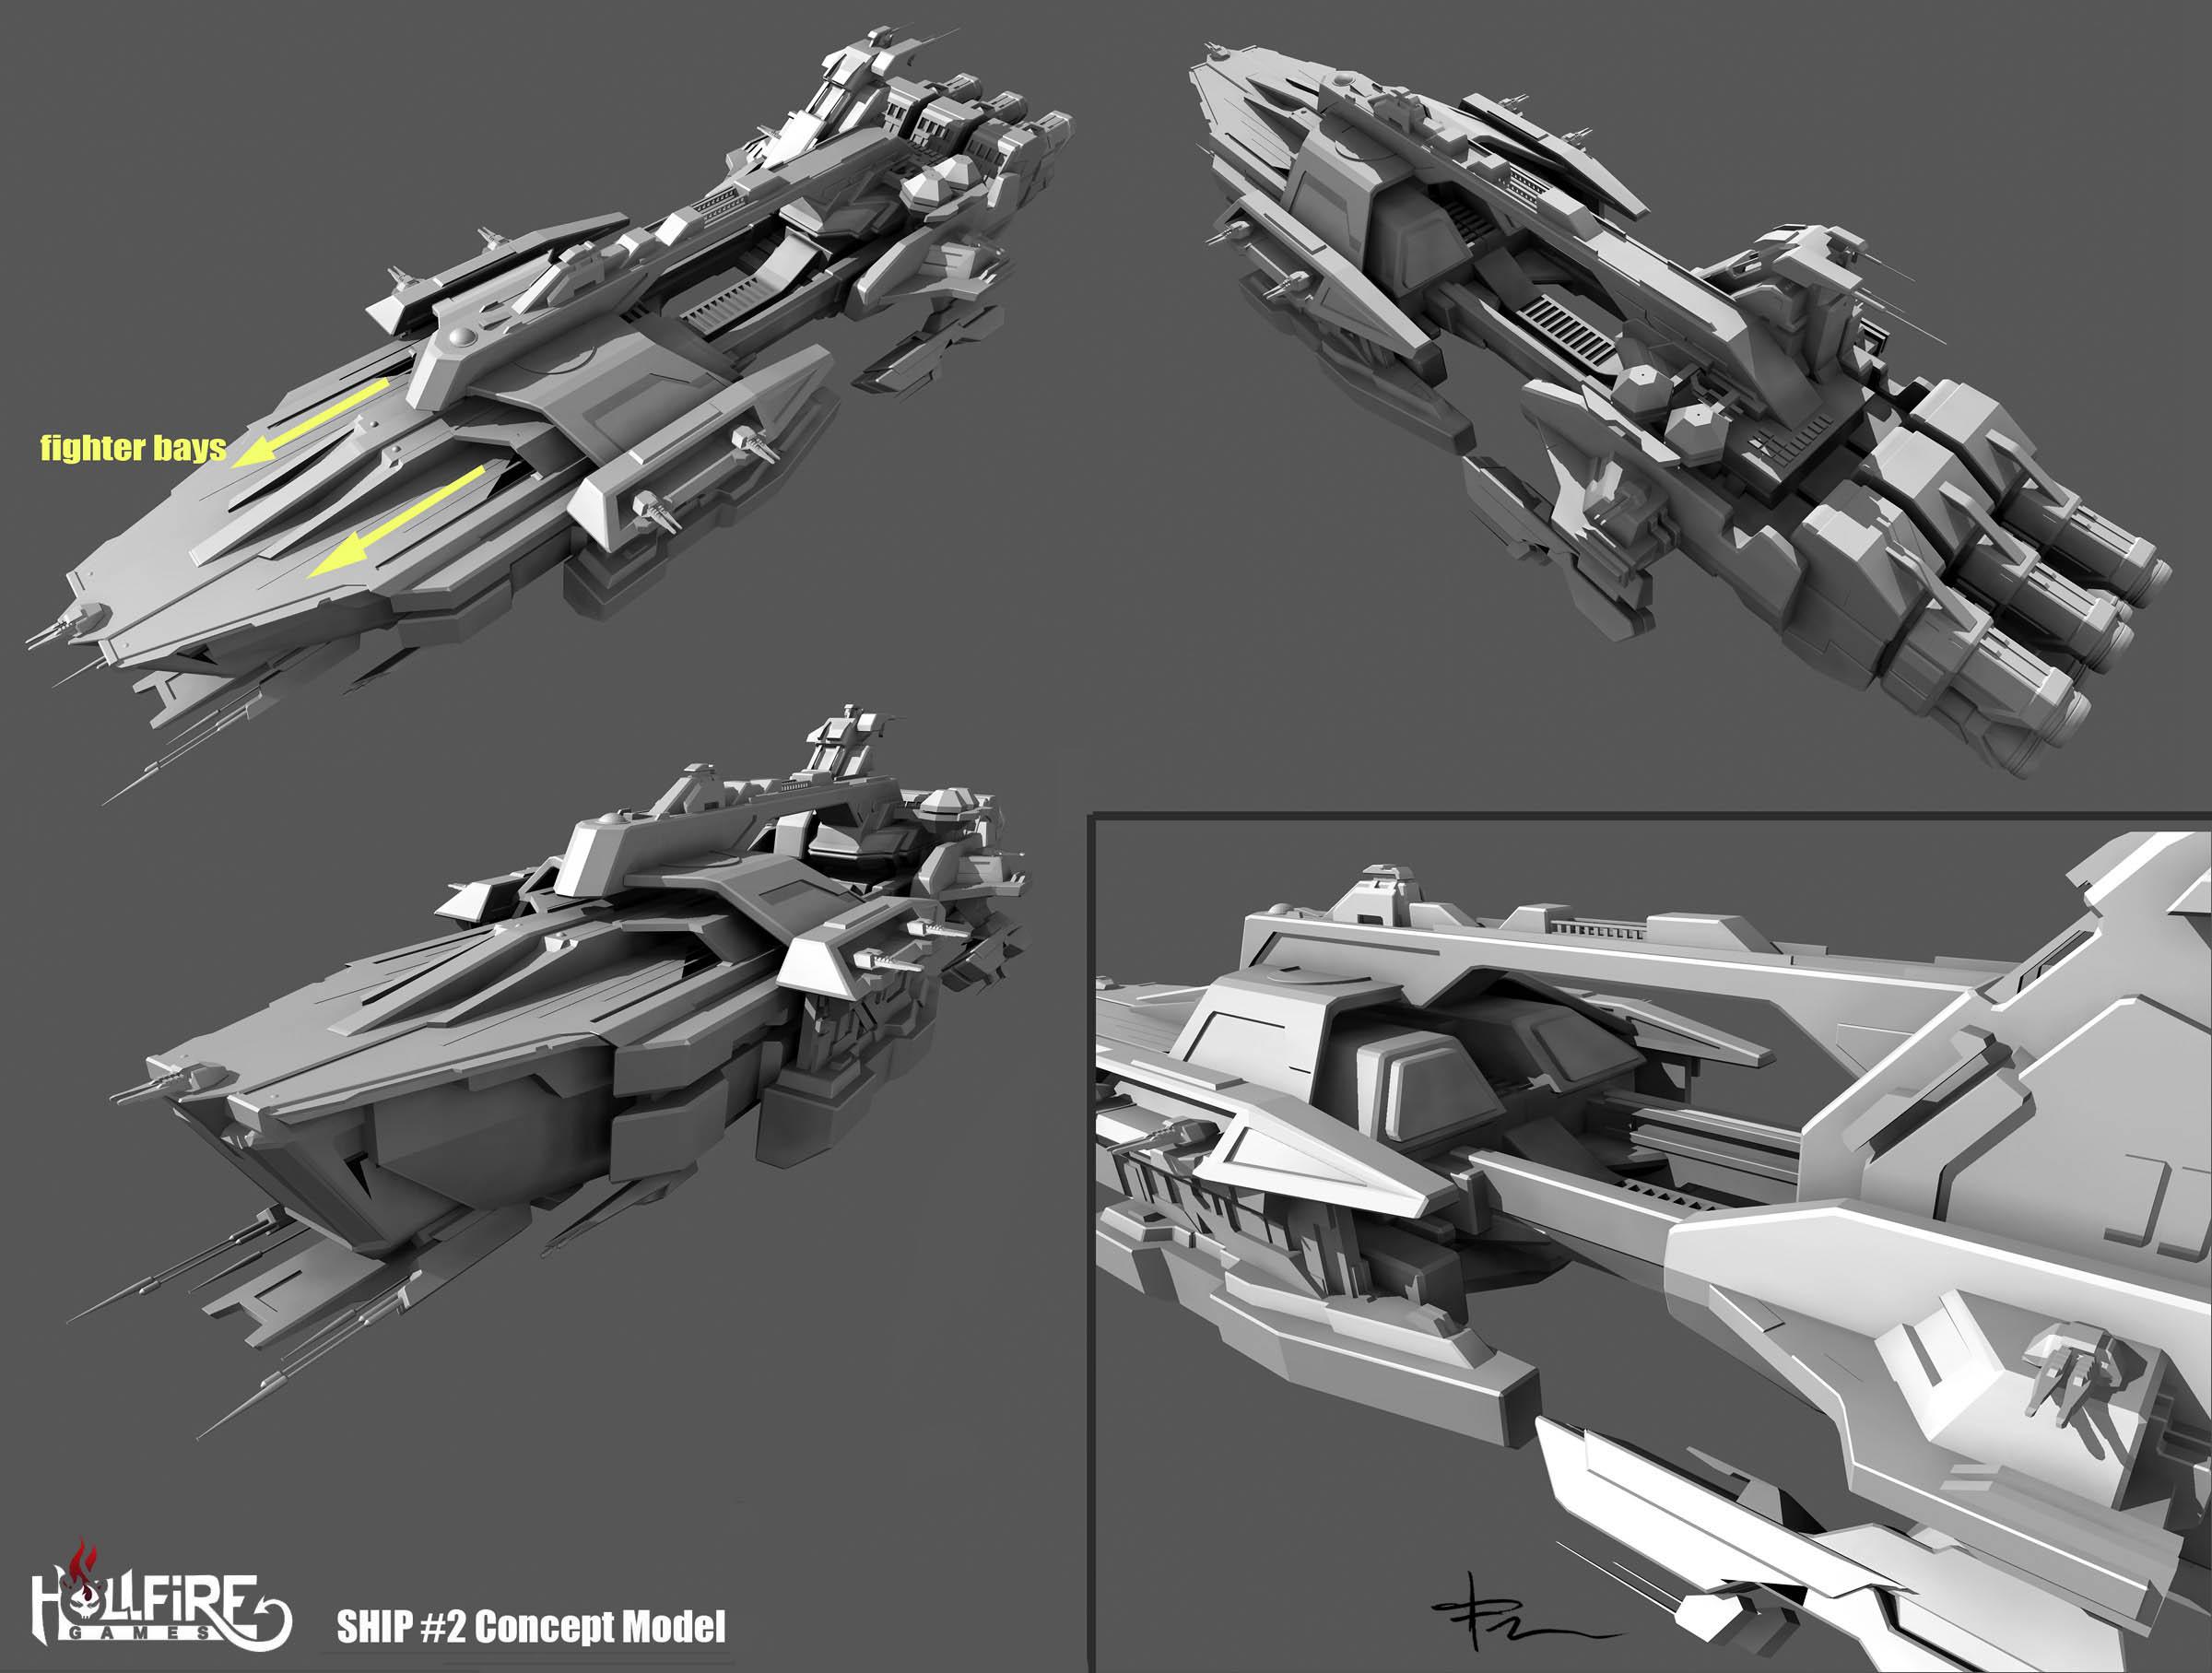 TJFrame-Art_HellfireGames_Ship2ConceptModel.jpg